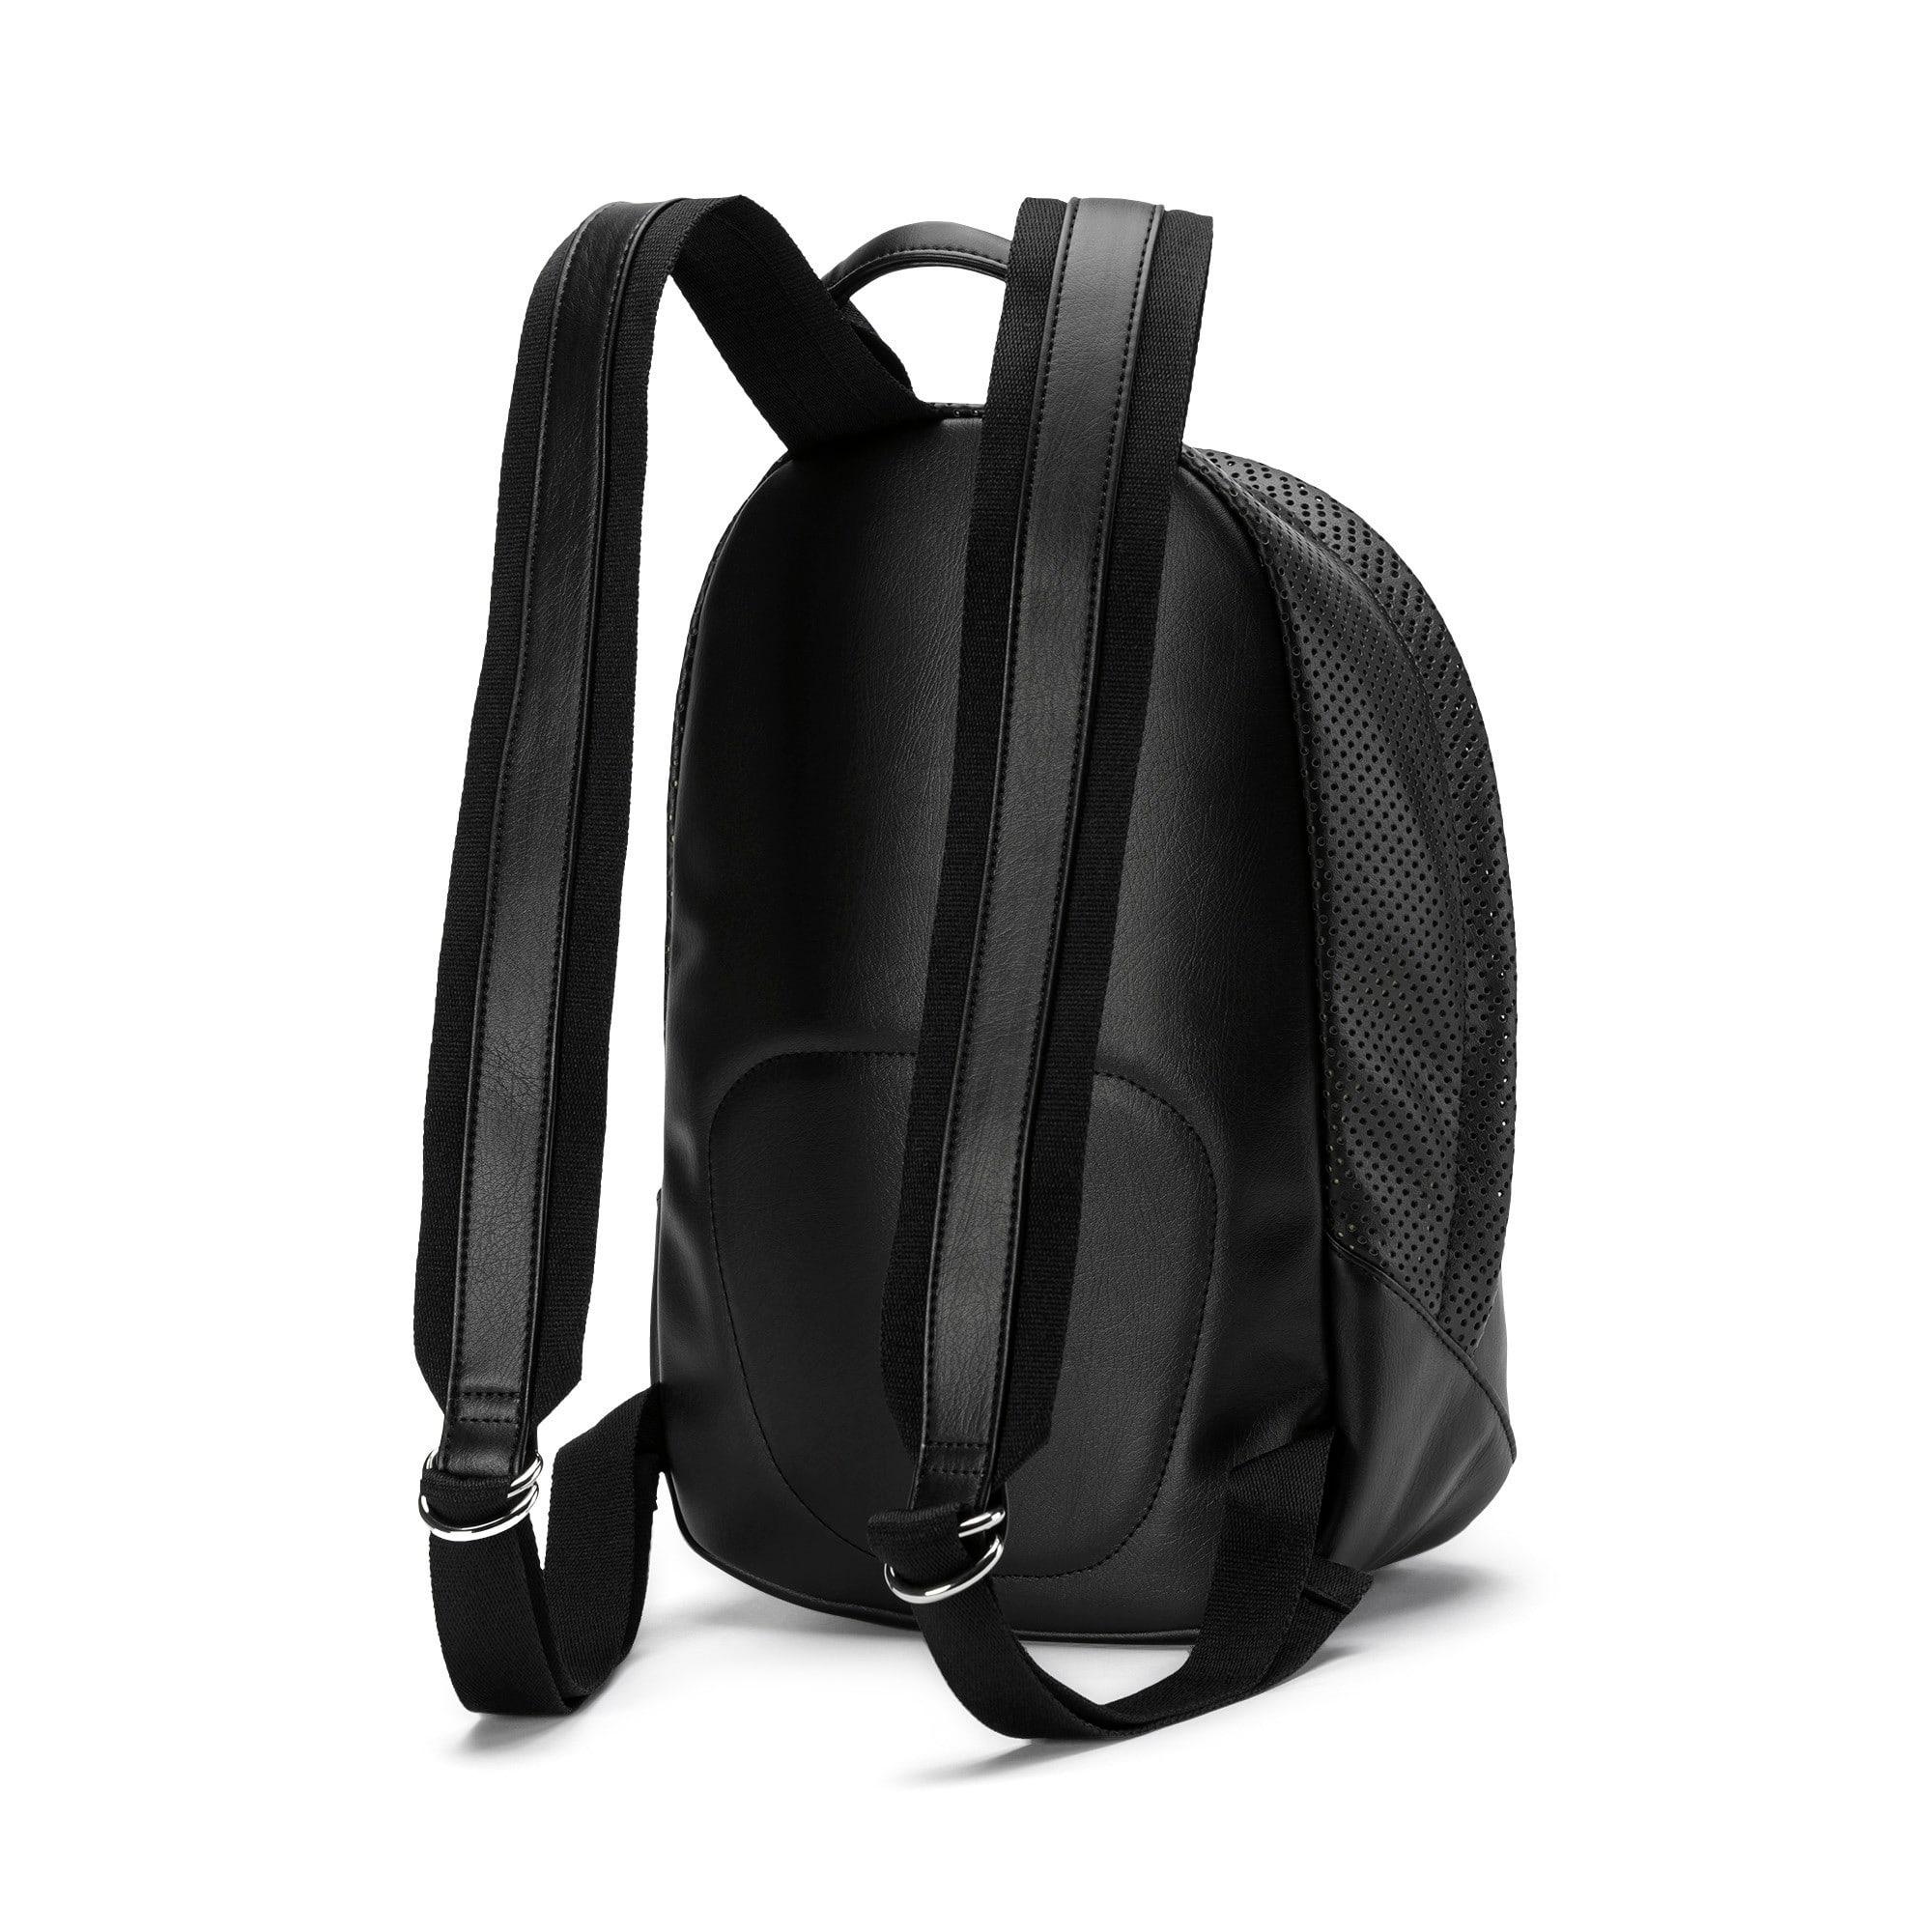 Thumbnail 3 of PUMA x SELENA GOMEZ Style Women's Backpack, Puma Black, medium